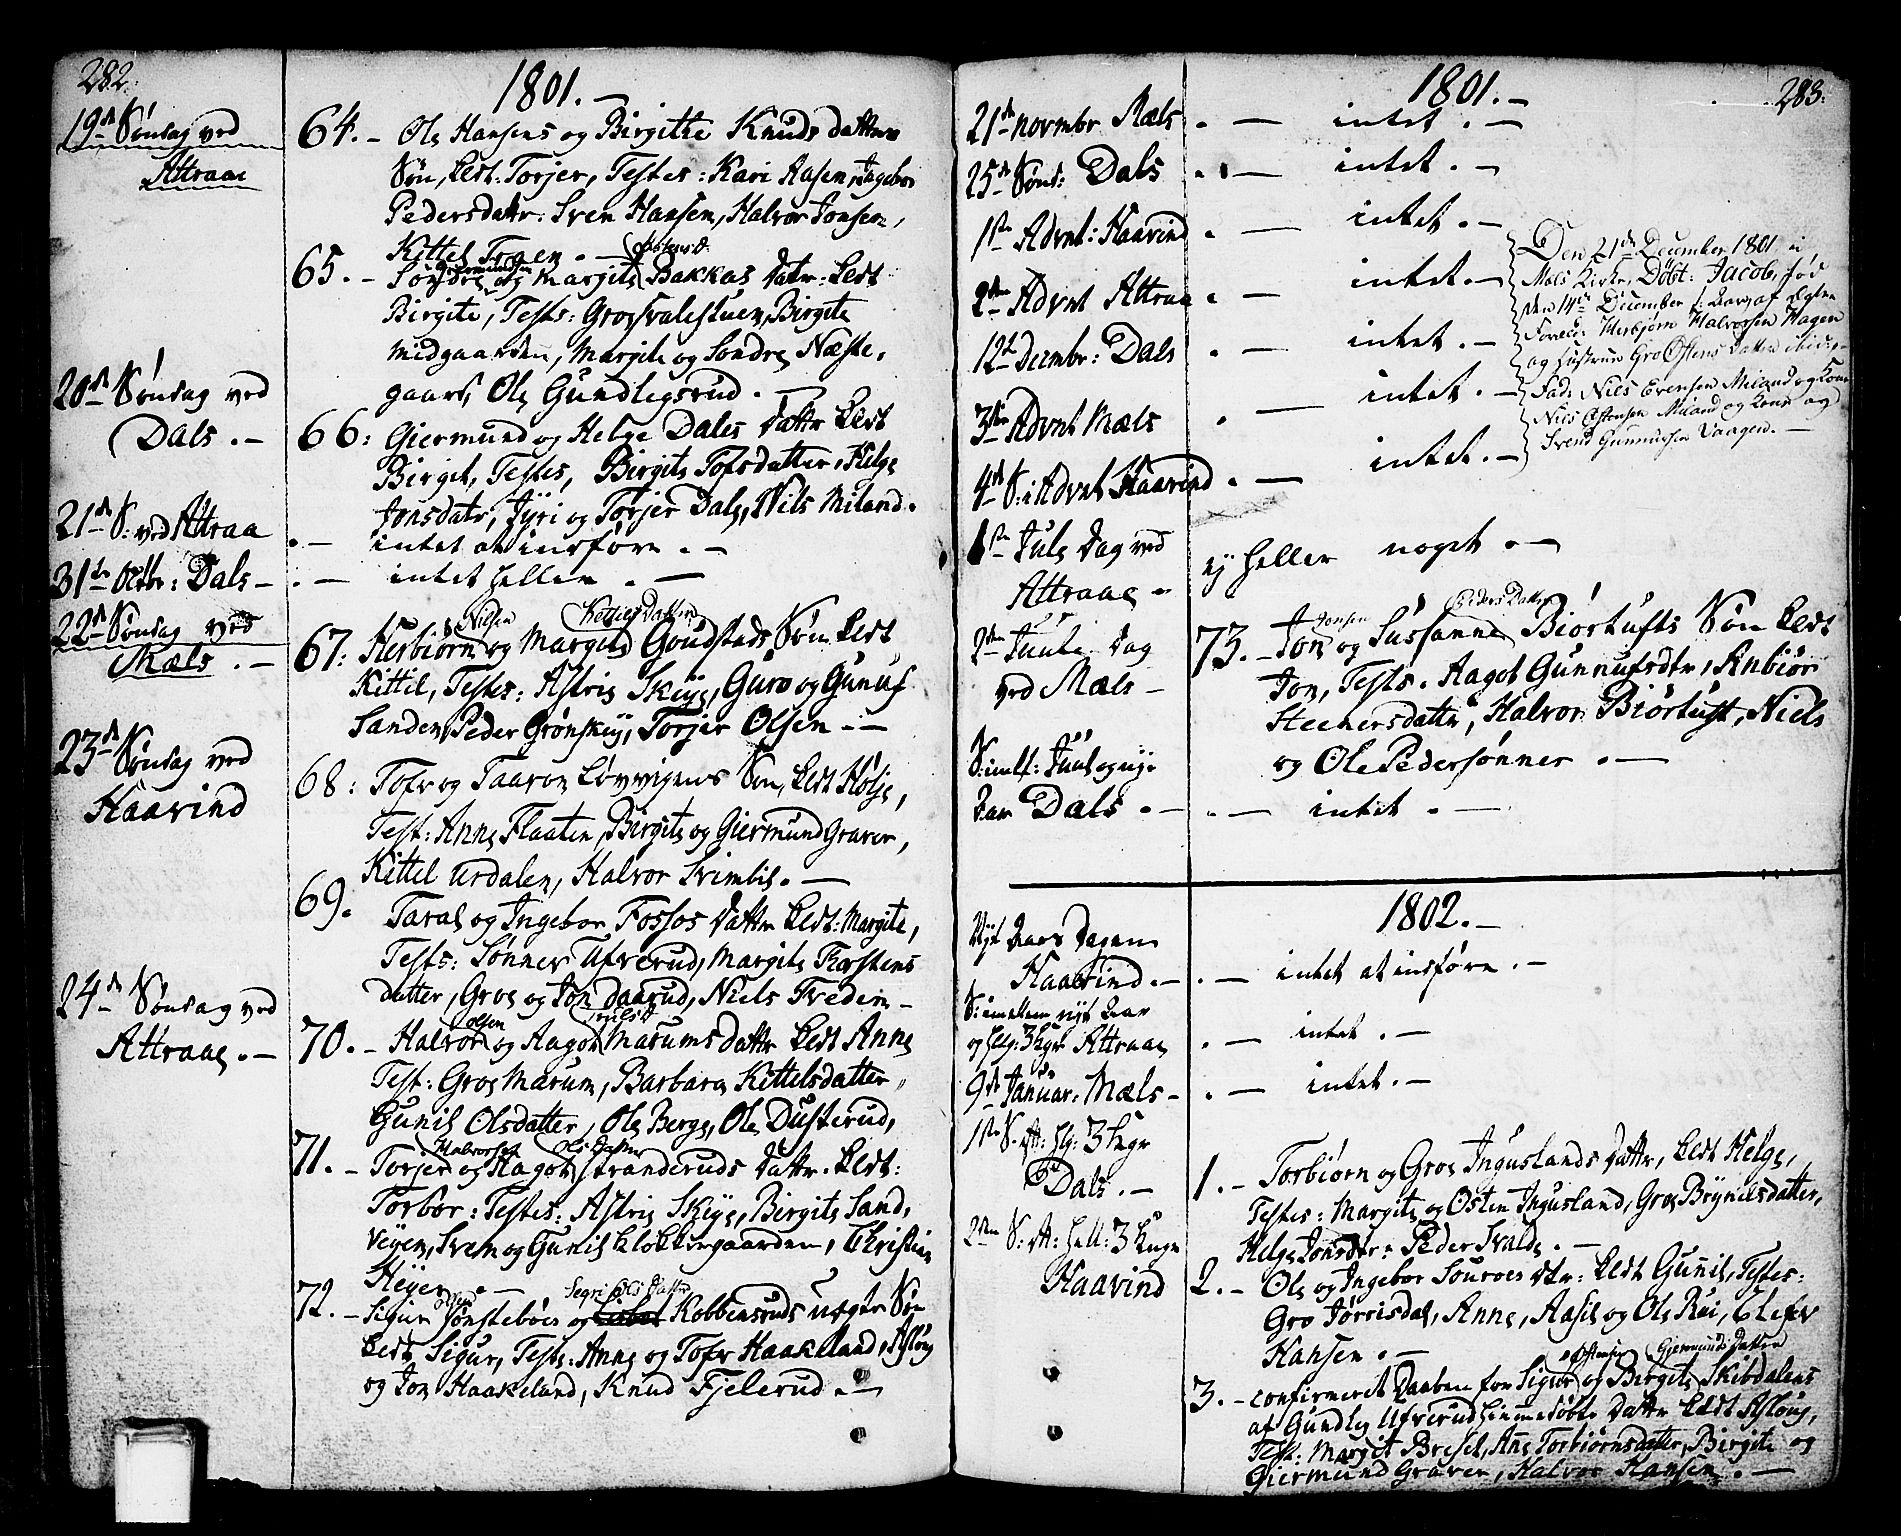 SAKO, Tinn kirkebøker, F/Fa/L0002: Ministerialbok nr. I 2, 1757-1810, s. 282-283